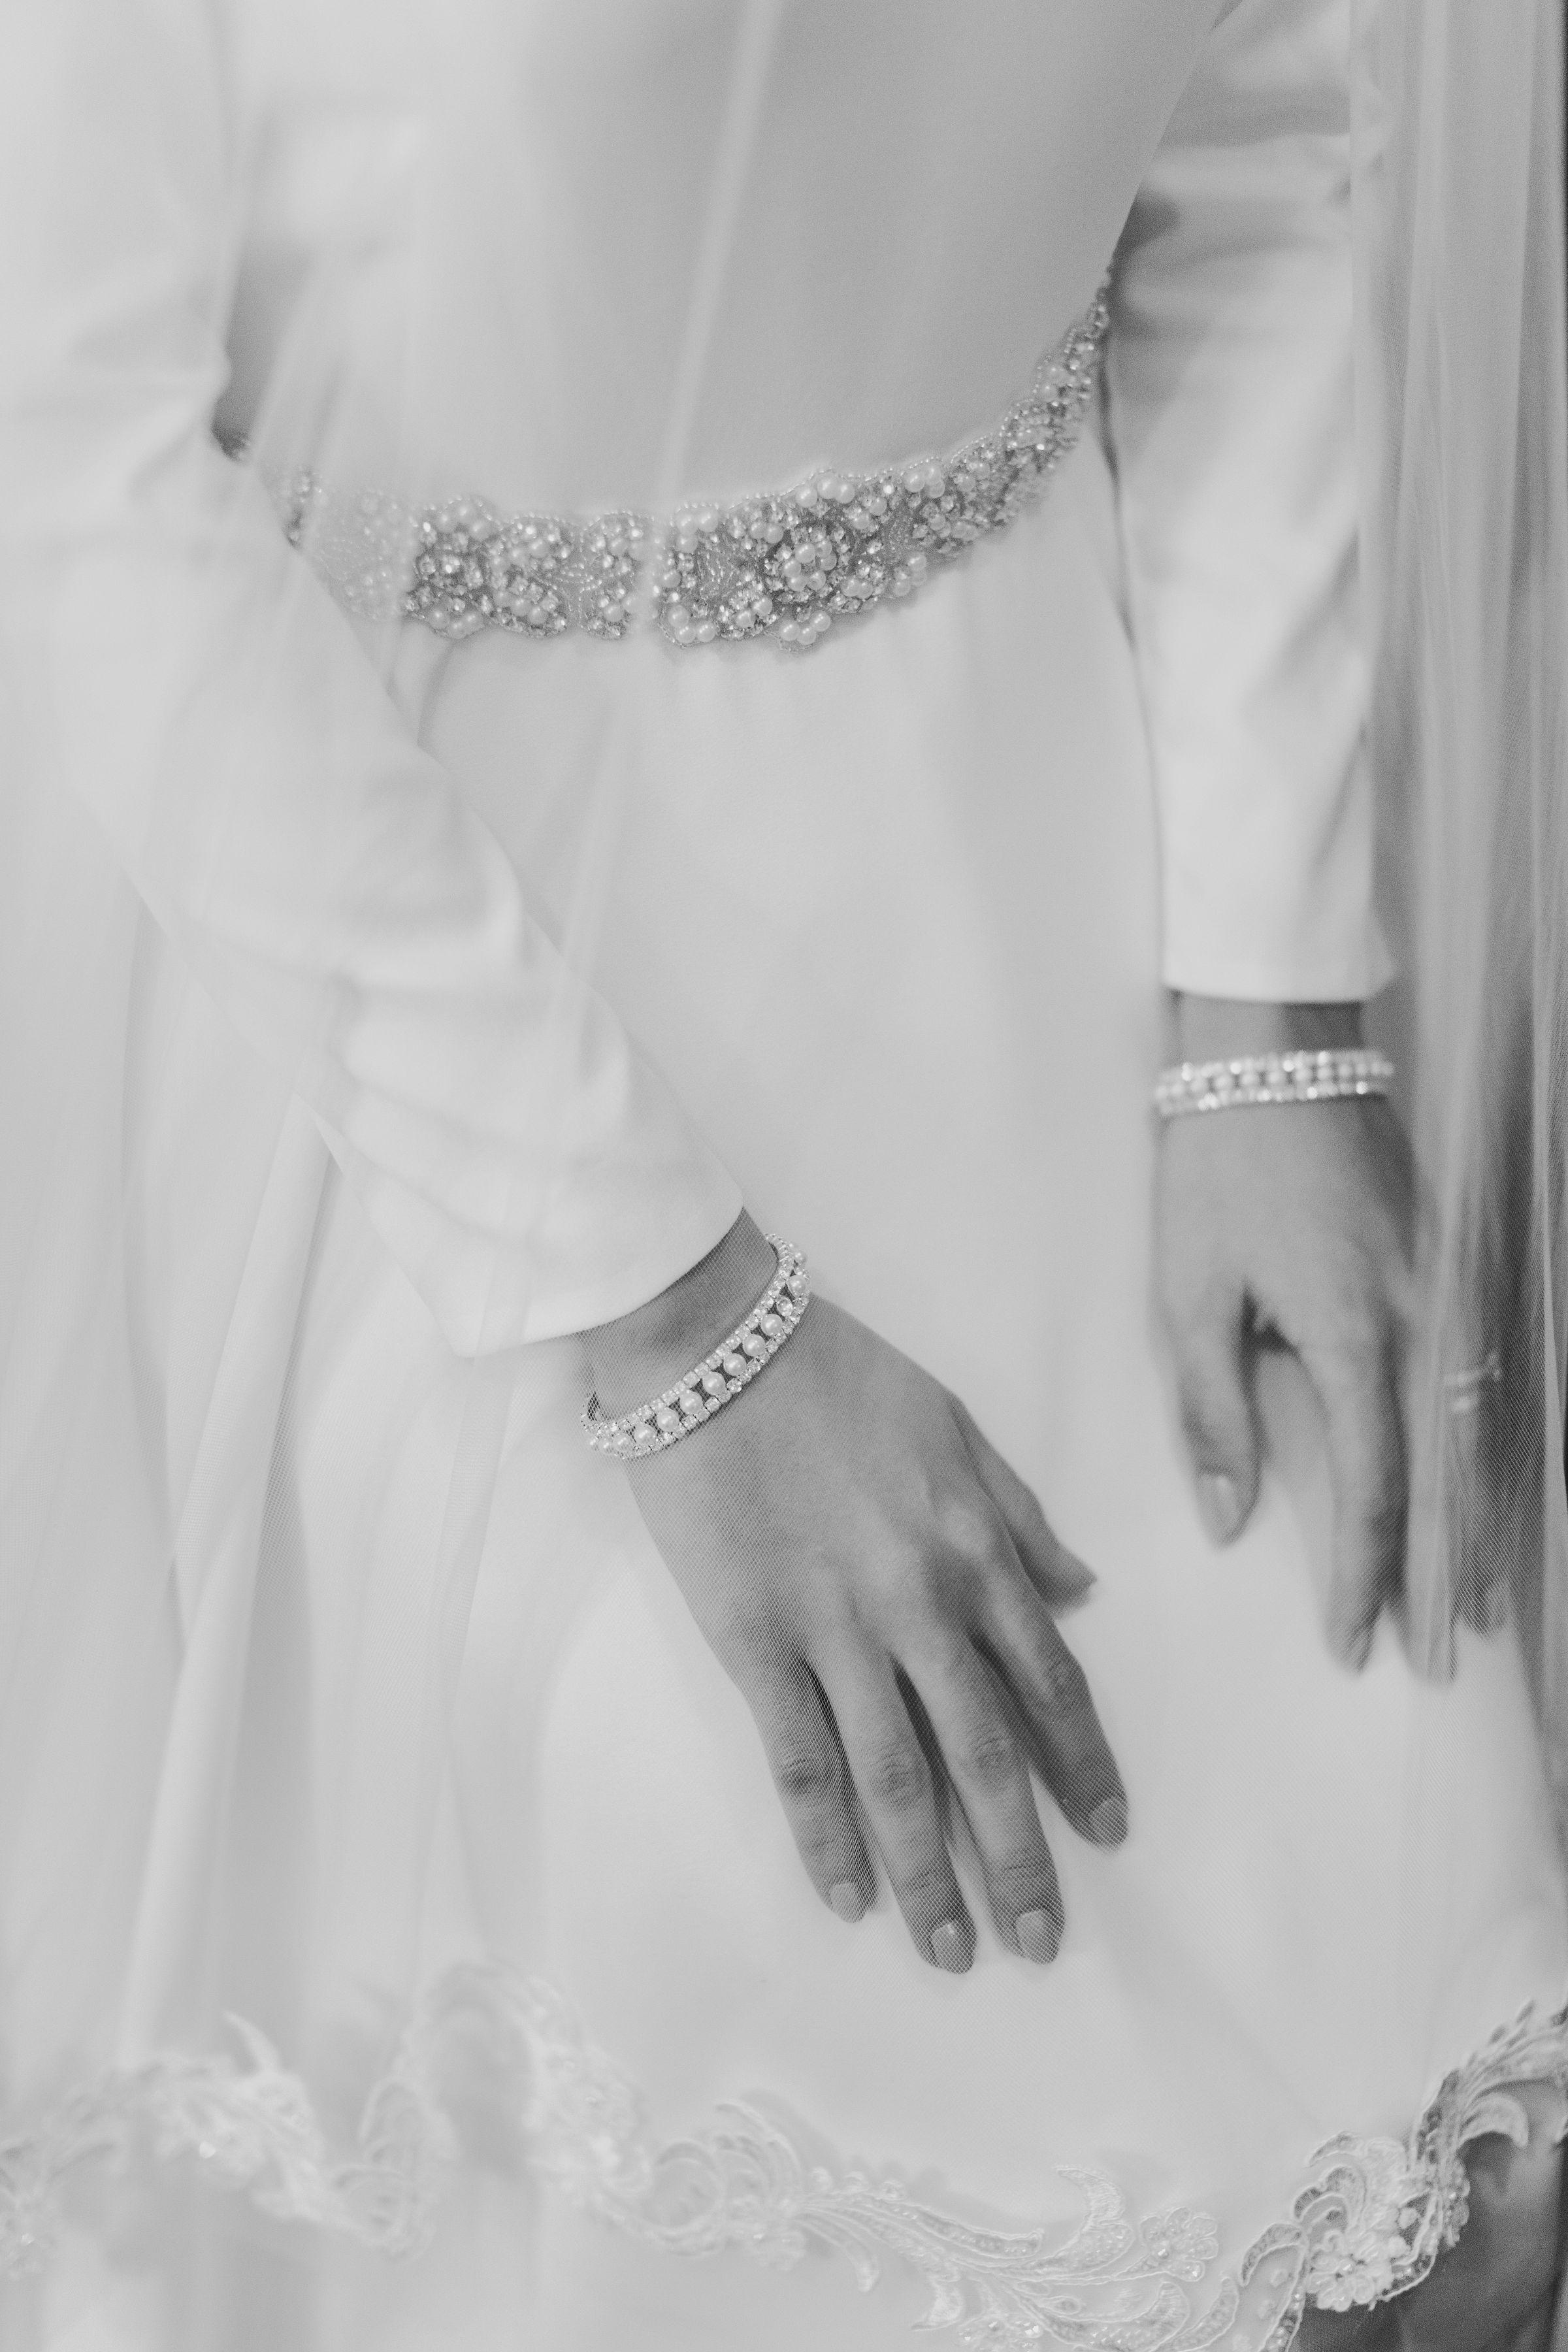 noha-sahnoune-wedding-portrait3